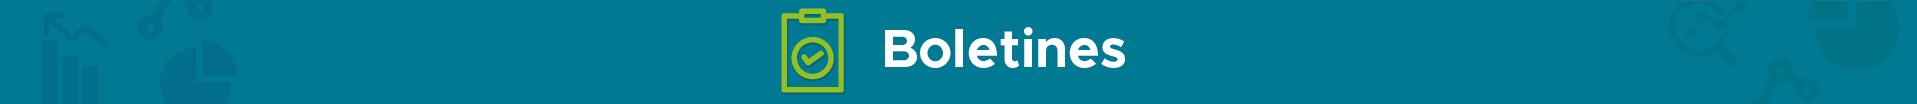 banner_boletines